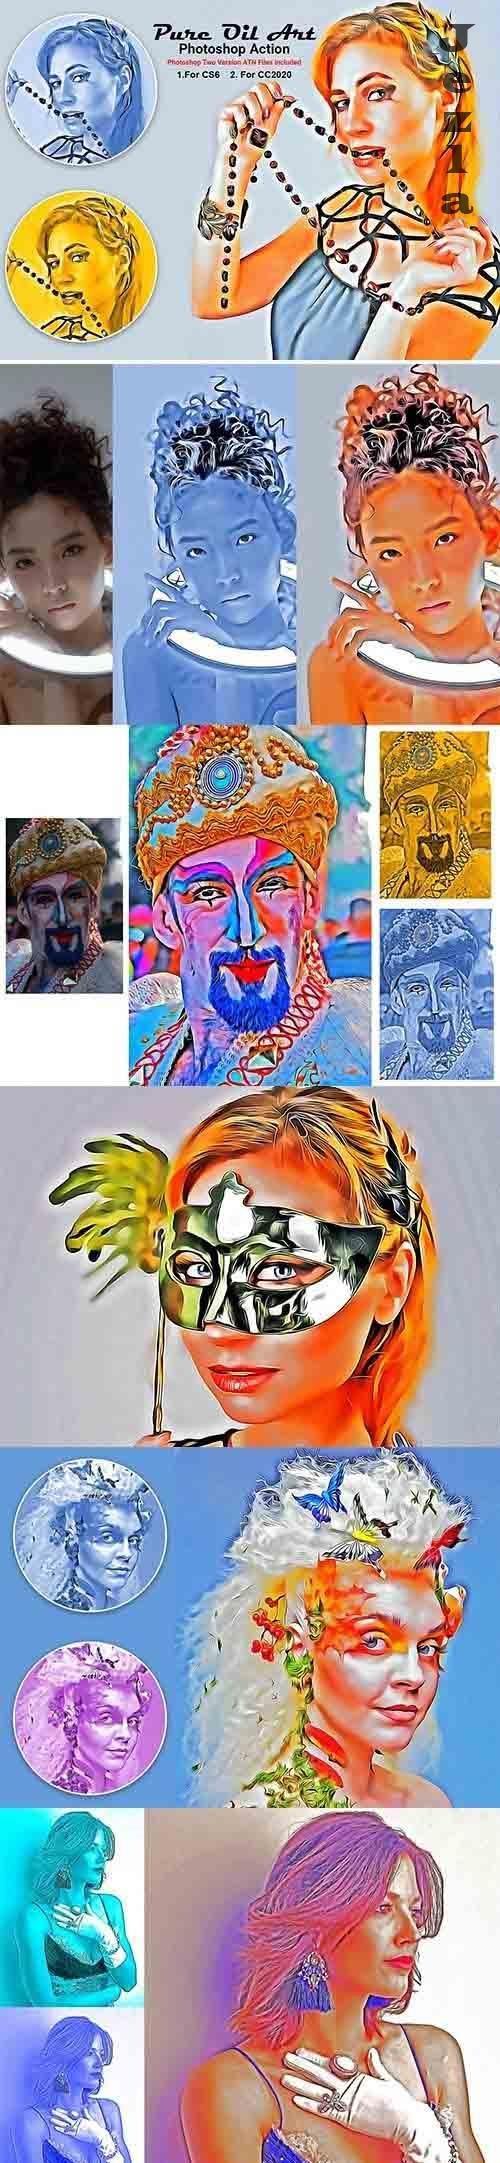 CreativeMarket - Pure Oil Art Photoshop Action 5323610